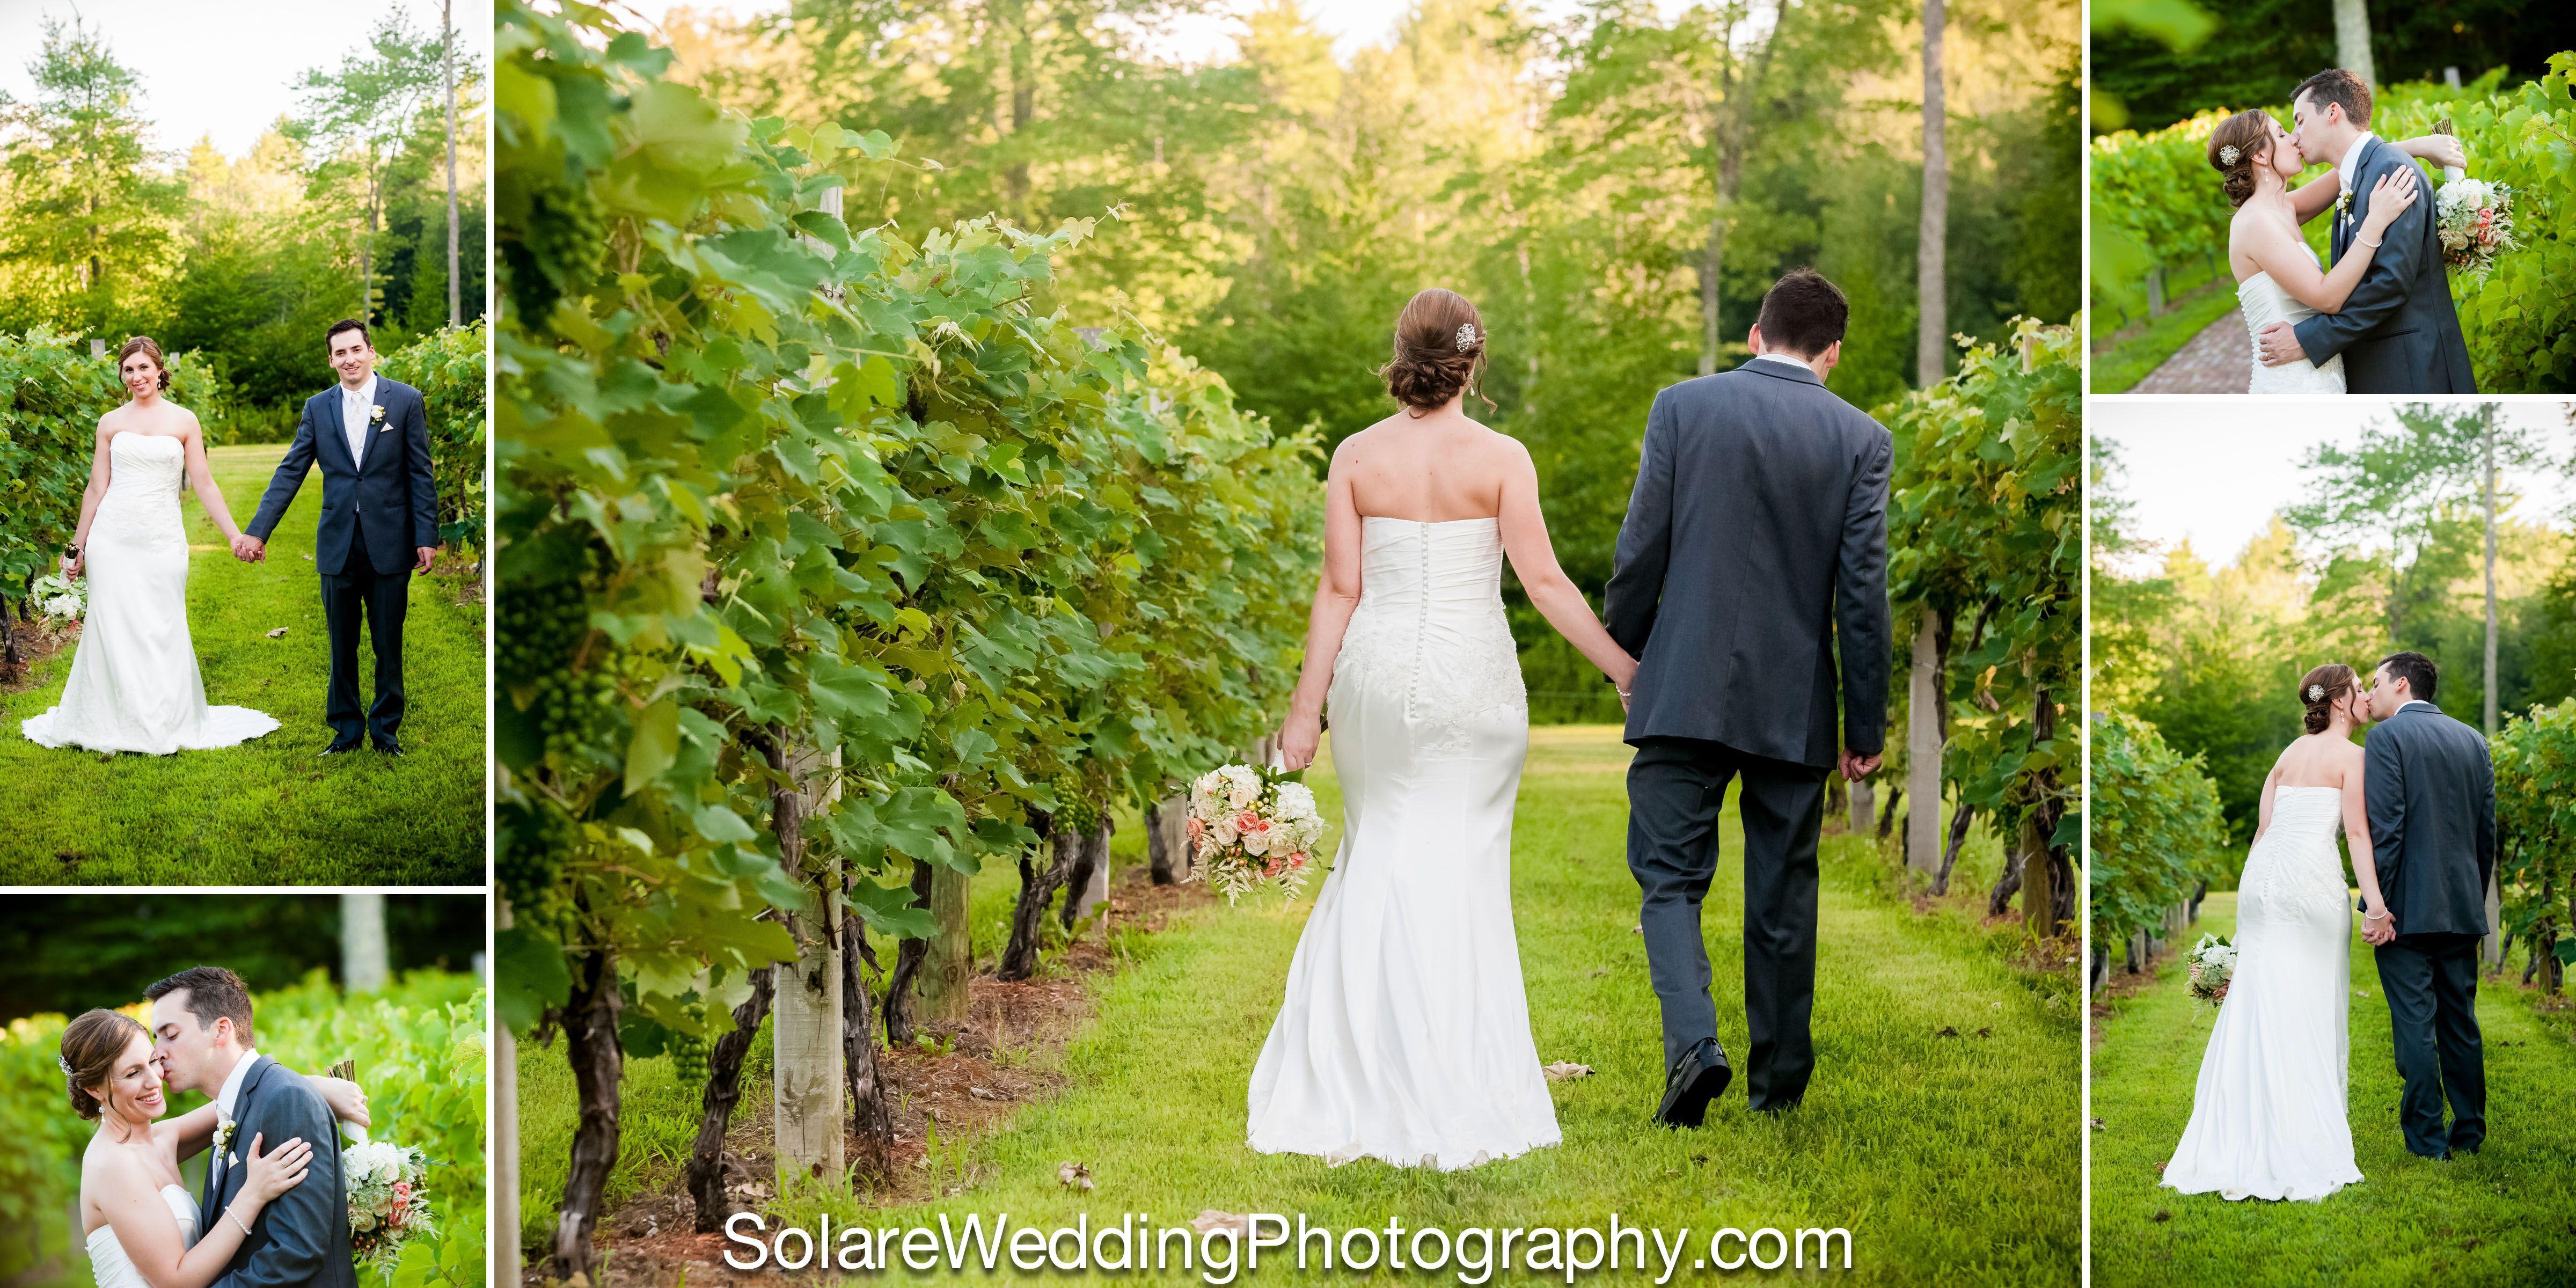 Wedding Photography At Zorvino Vineyards In Sandown Nh New Hampshire Wedding Photographers Zorvino Vineyard Vineyard Wedding Wedding Photography